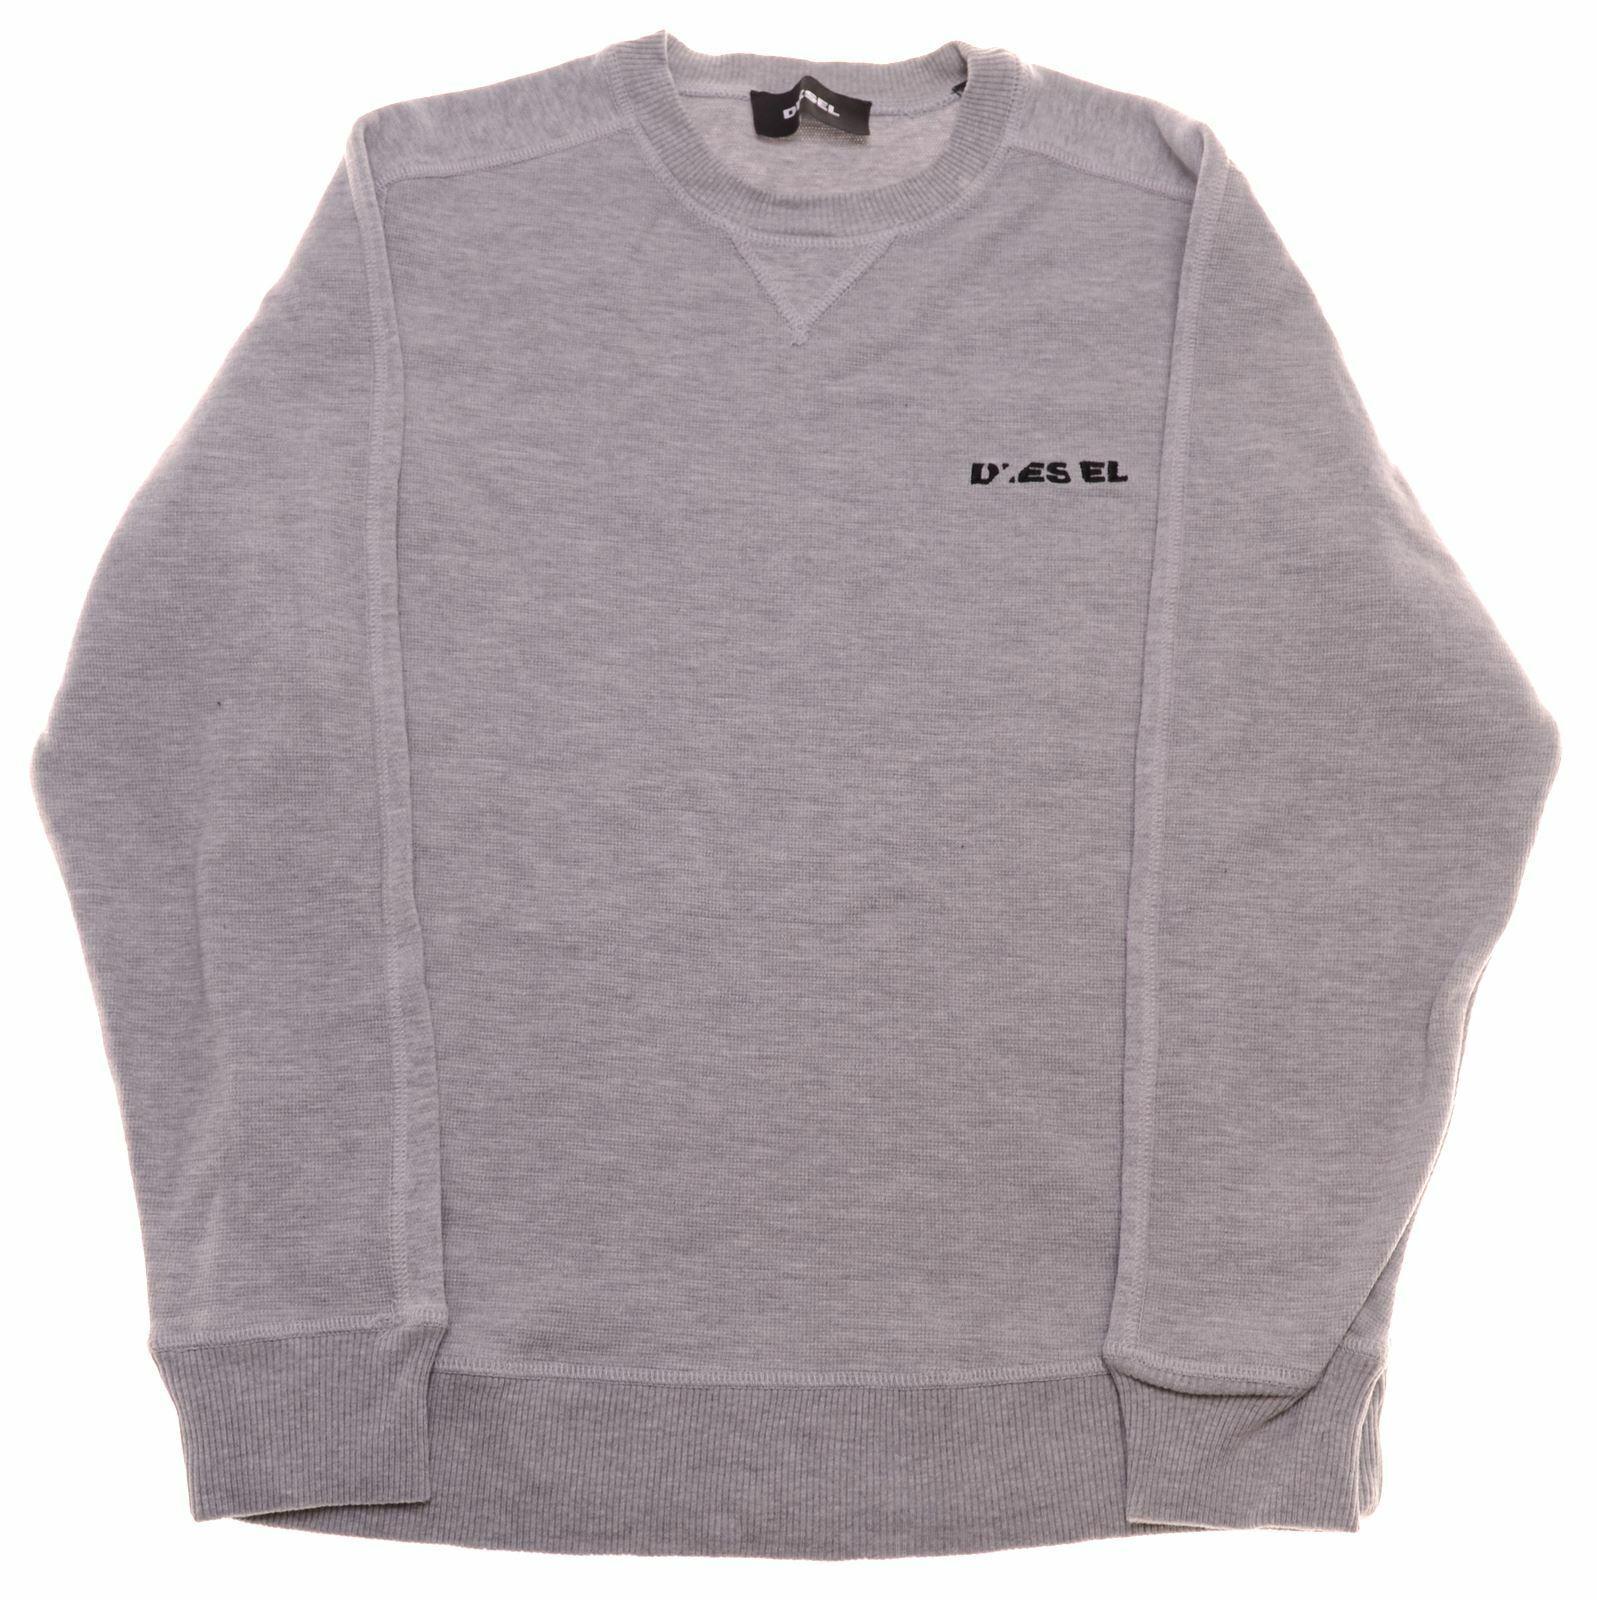 DIESEL Mens Sweatshirt Jumper Medium Grey Cotton JK08